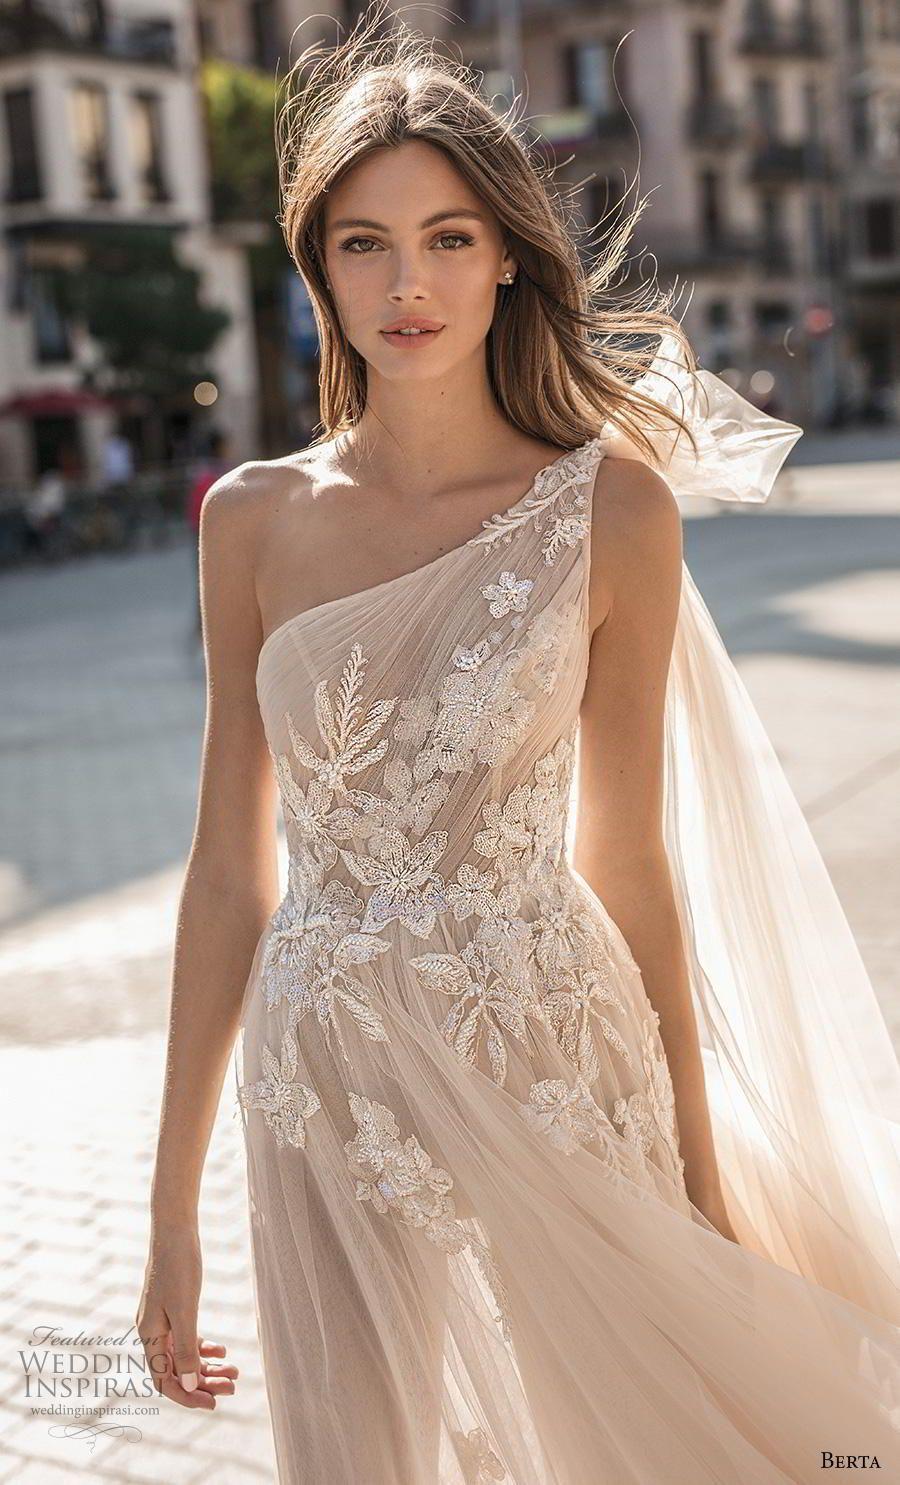 Watch - One wedding shoulder dress hair video